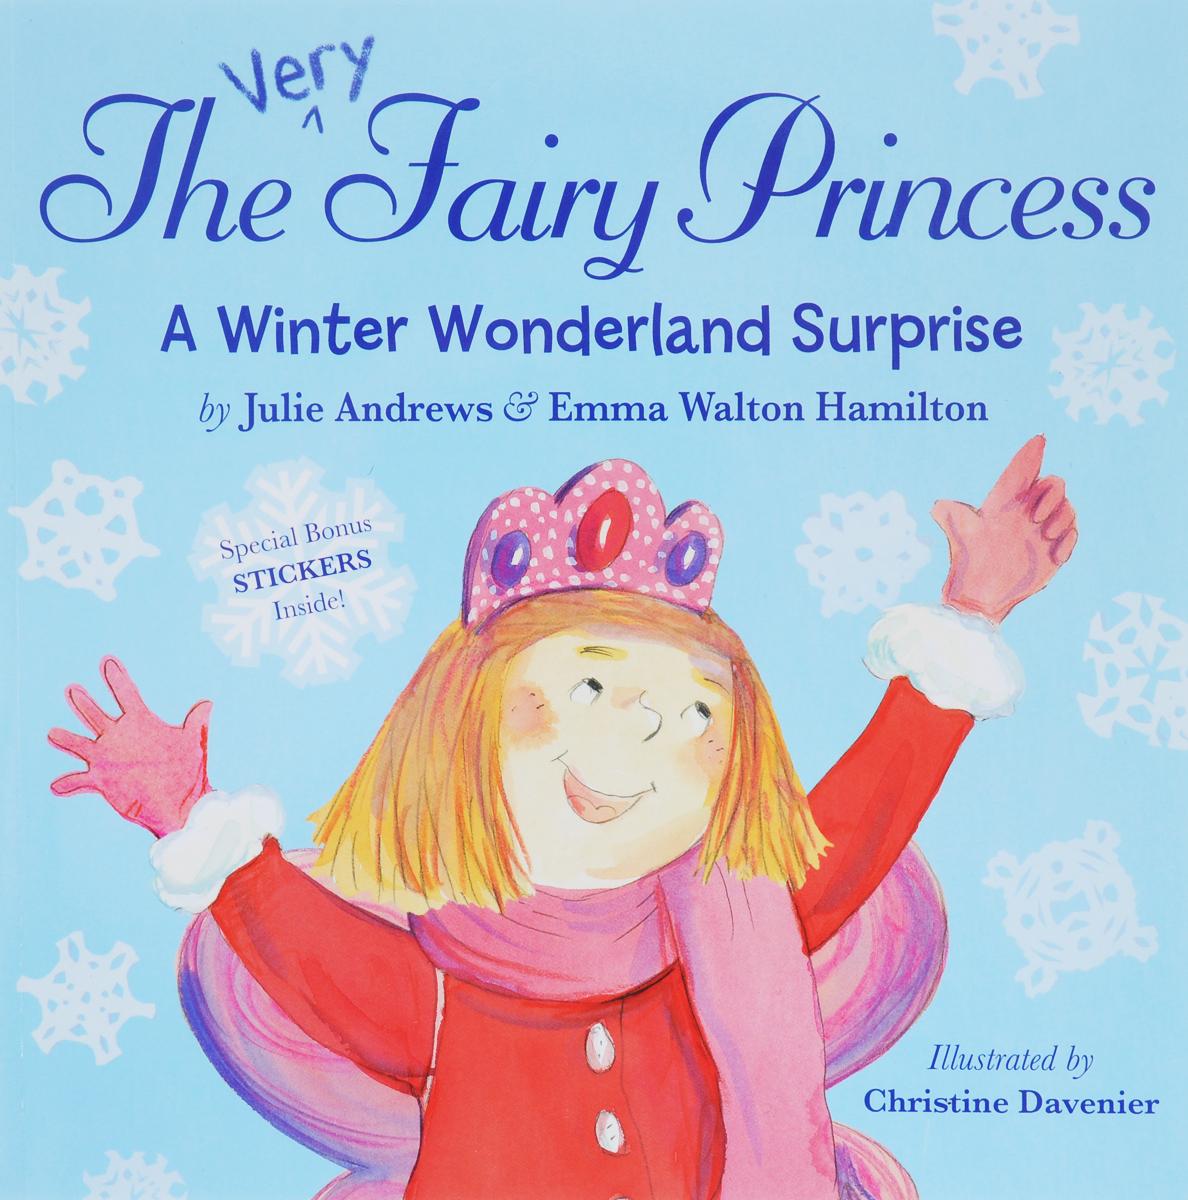 The Very Fairy Princess: A Winter Wonderland Surprise (+ наклейки) светильники trousselier абажур princess fairy 34х22 см